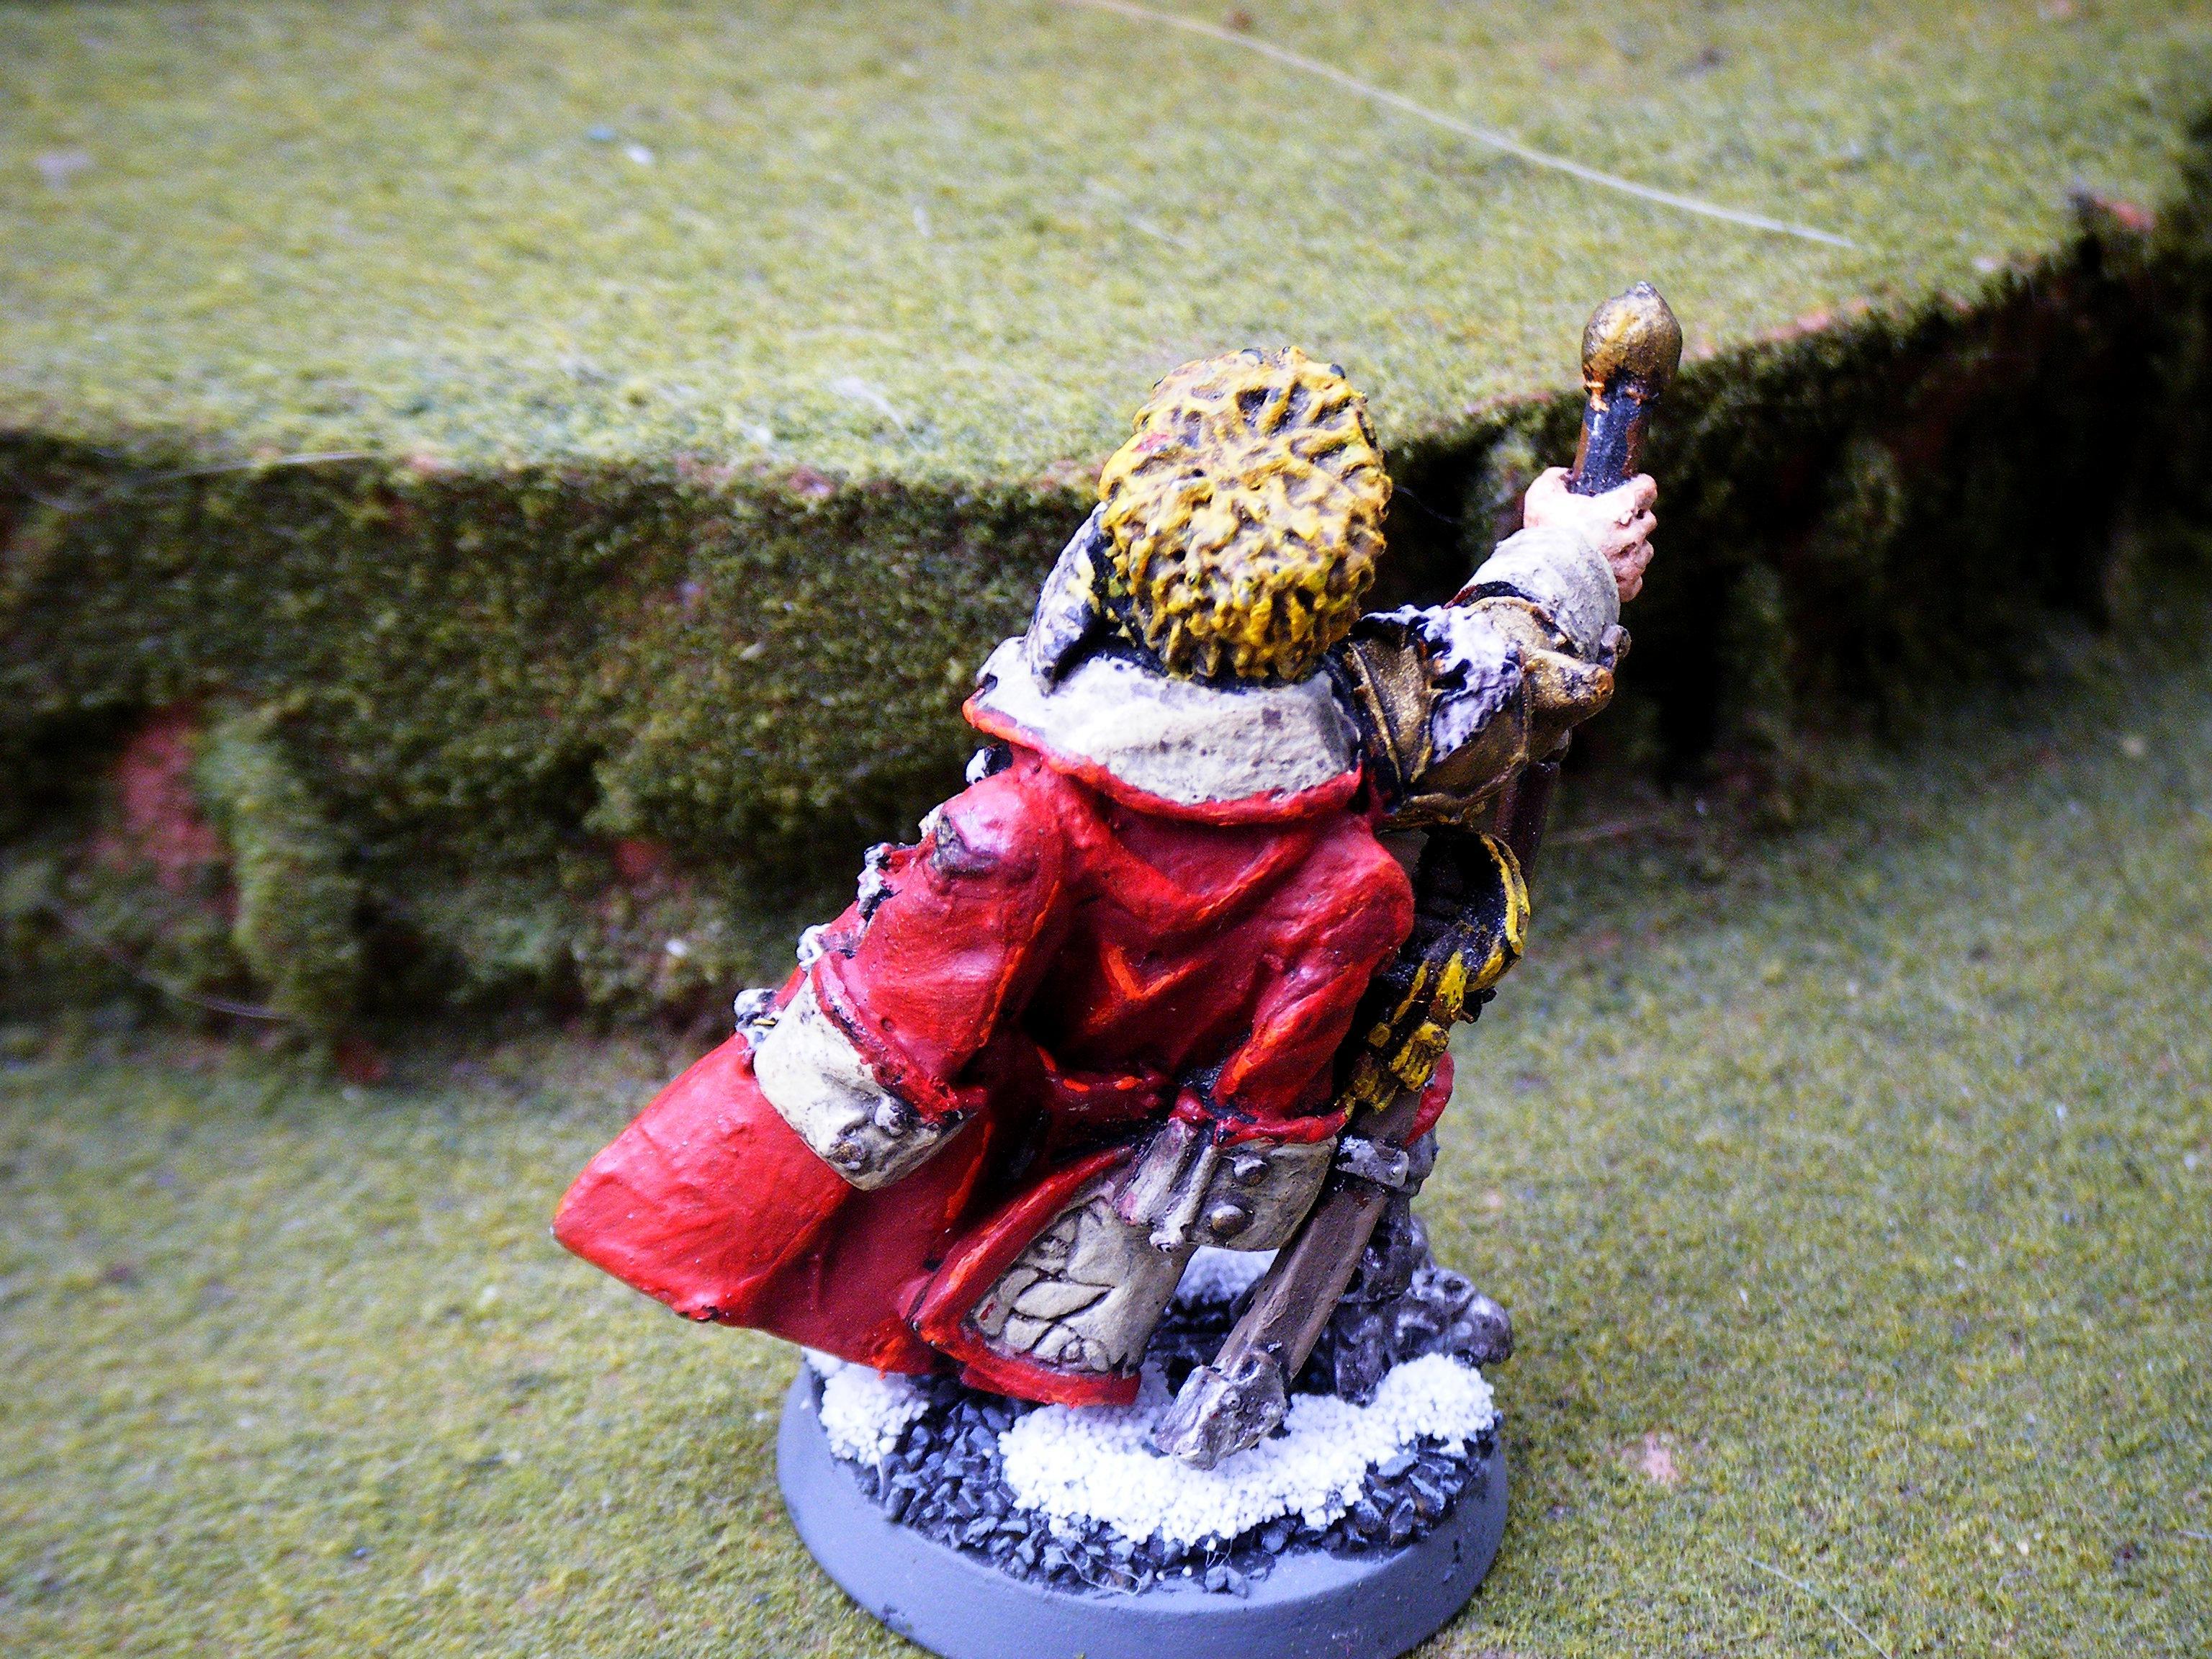 Imperial Guard, company commander back